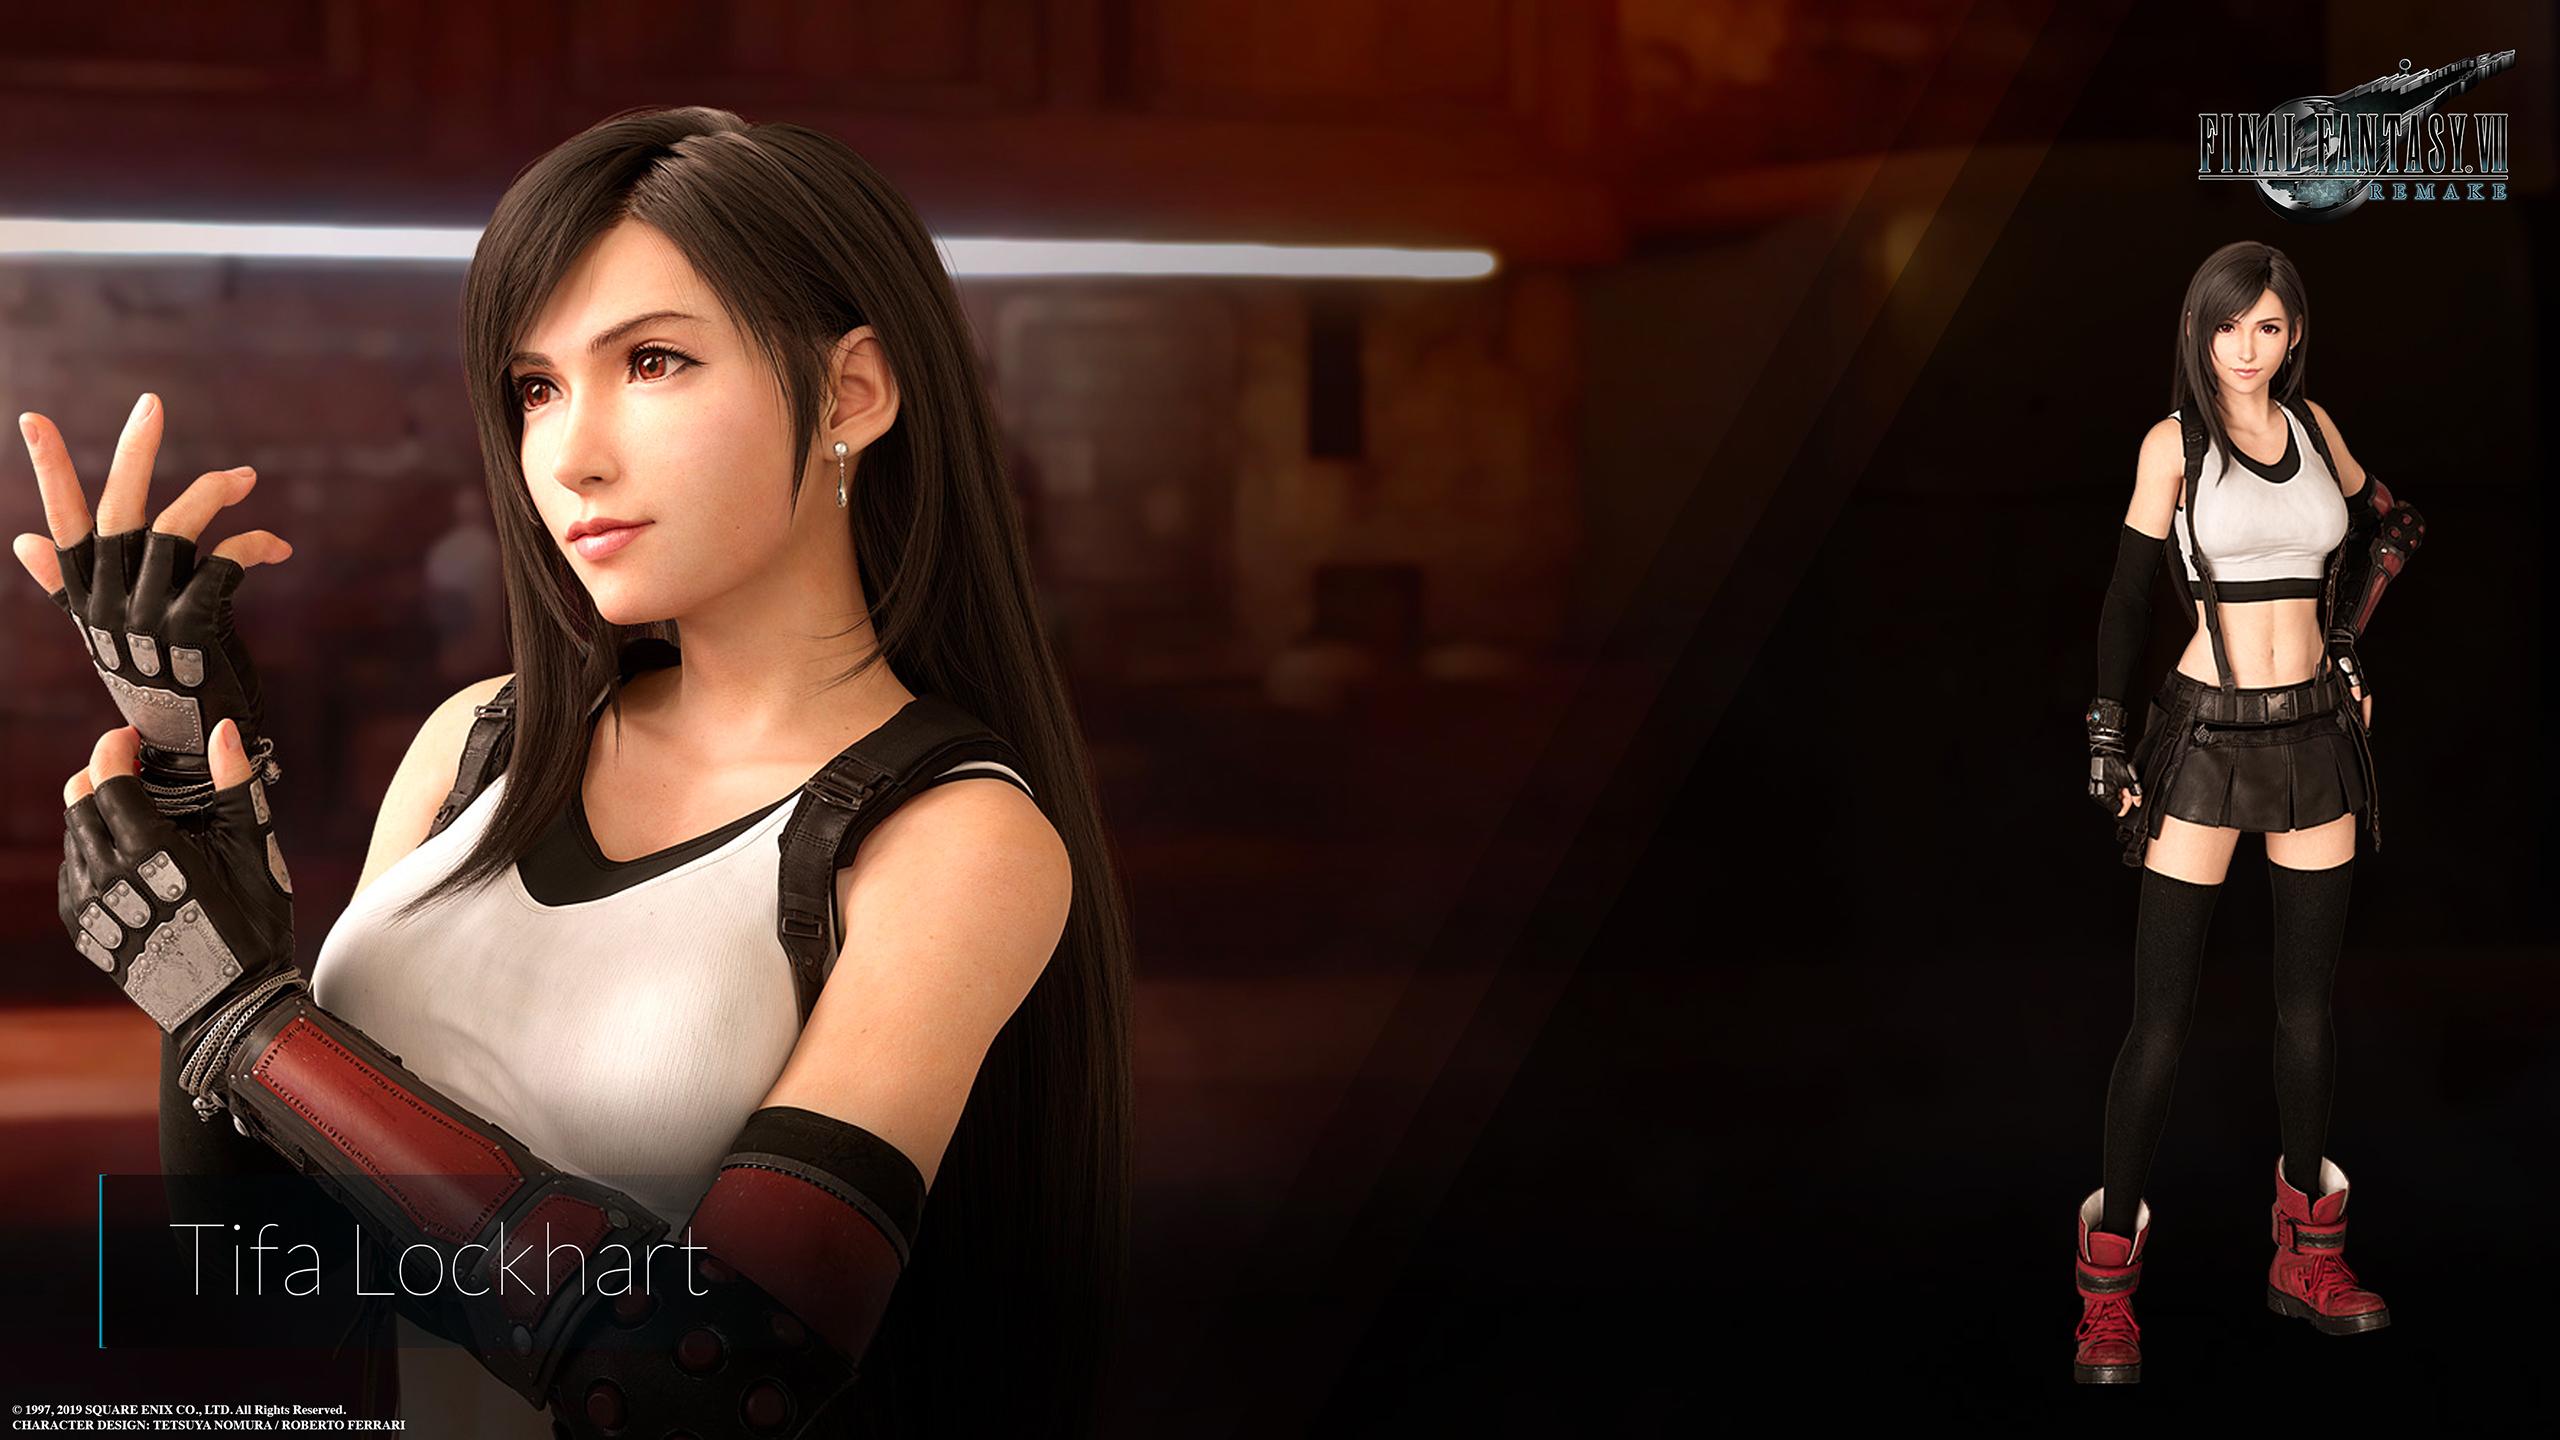 Final Fantasy Vii Remake Tifa Version 2 Wallpaper Cat With Monocle